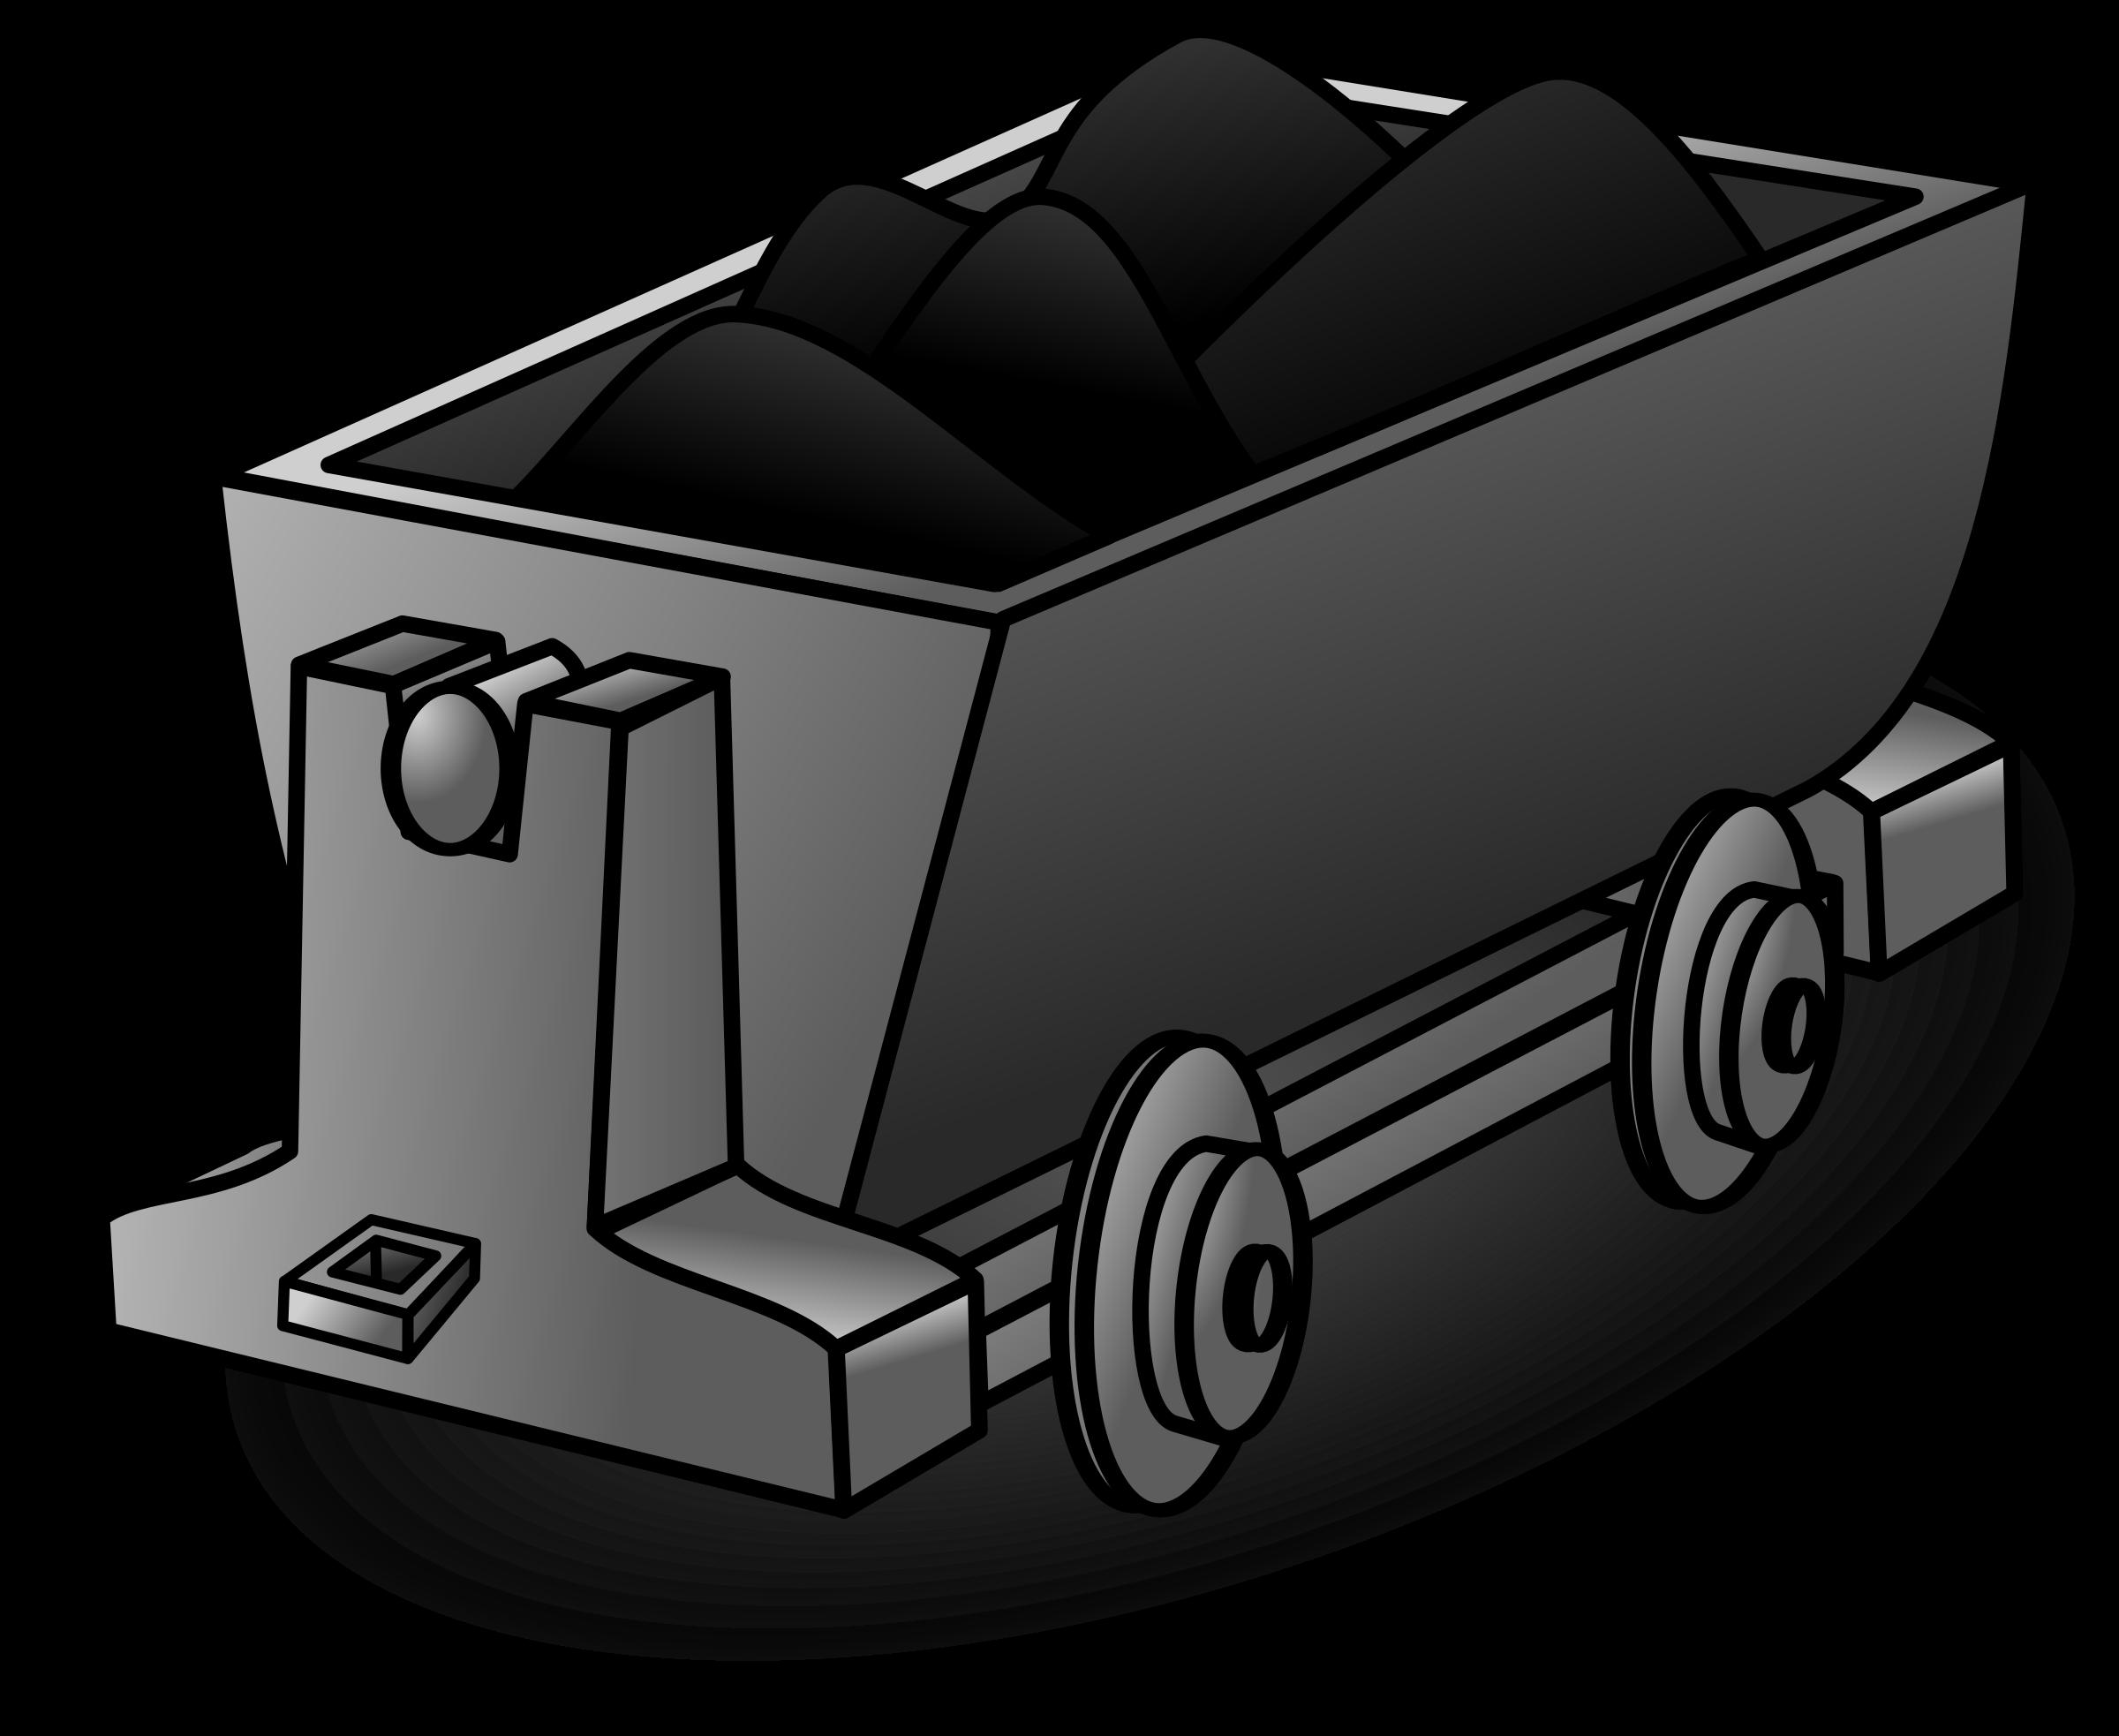 clip transparent stock Lorry big image png. Coal clipart.